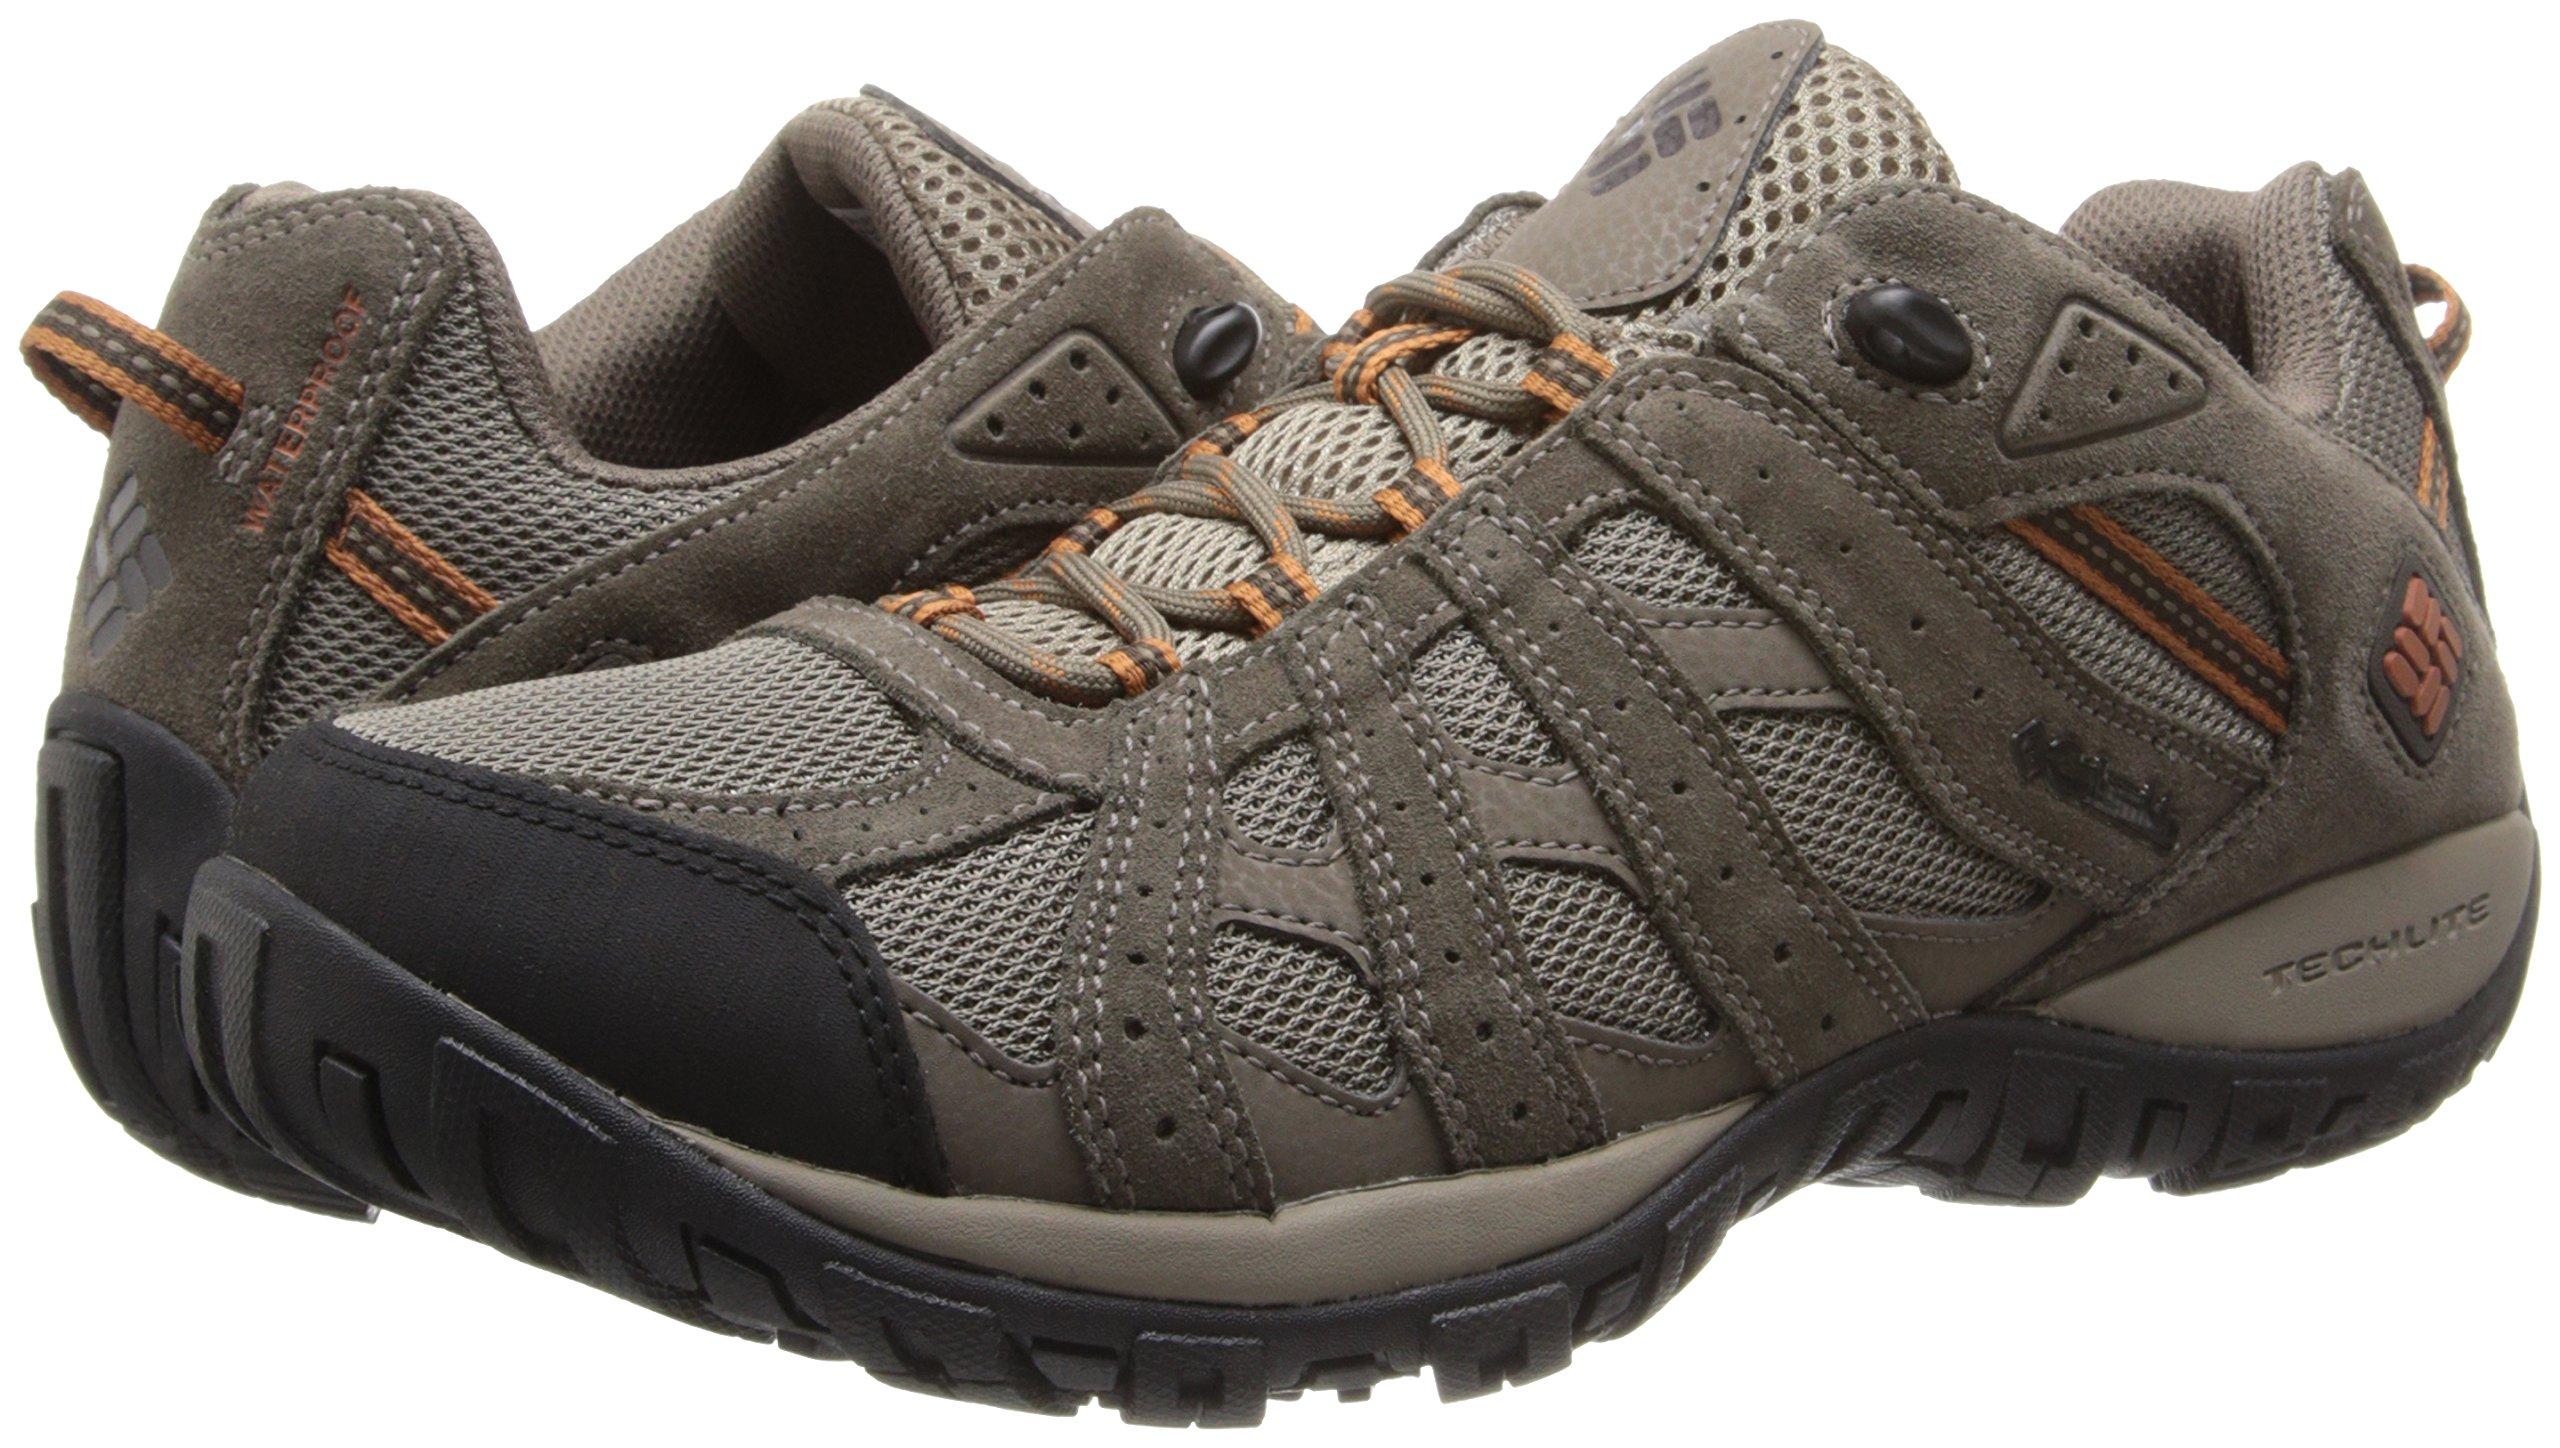 Columbia Men's Redmond Waterproof Hiking Shoe Pebble, Dark Ginger 7 D US by Columbia (Image #6)